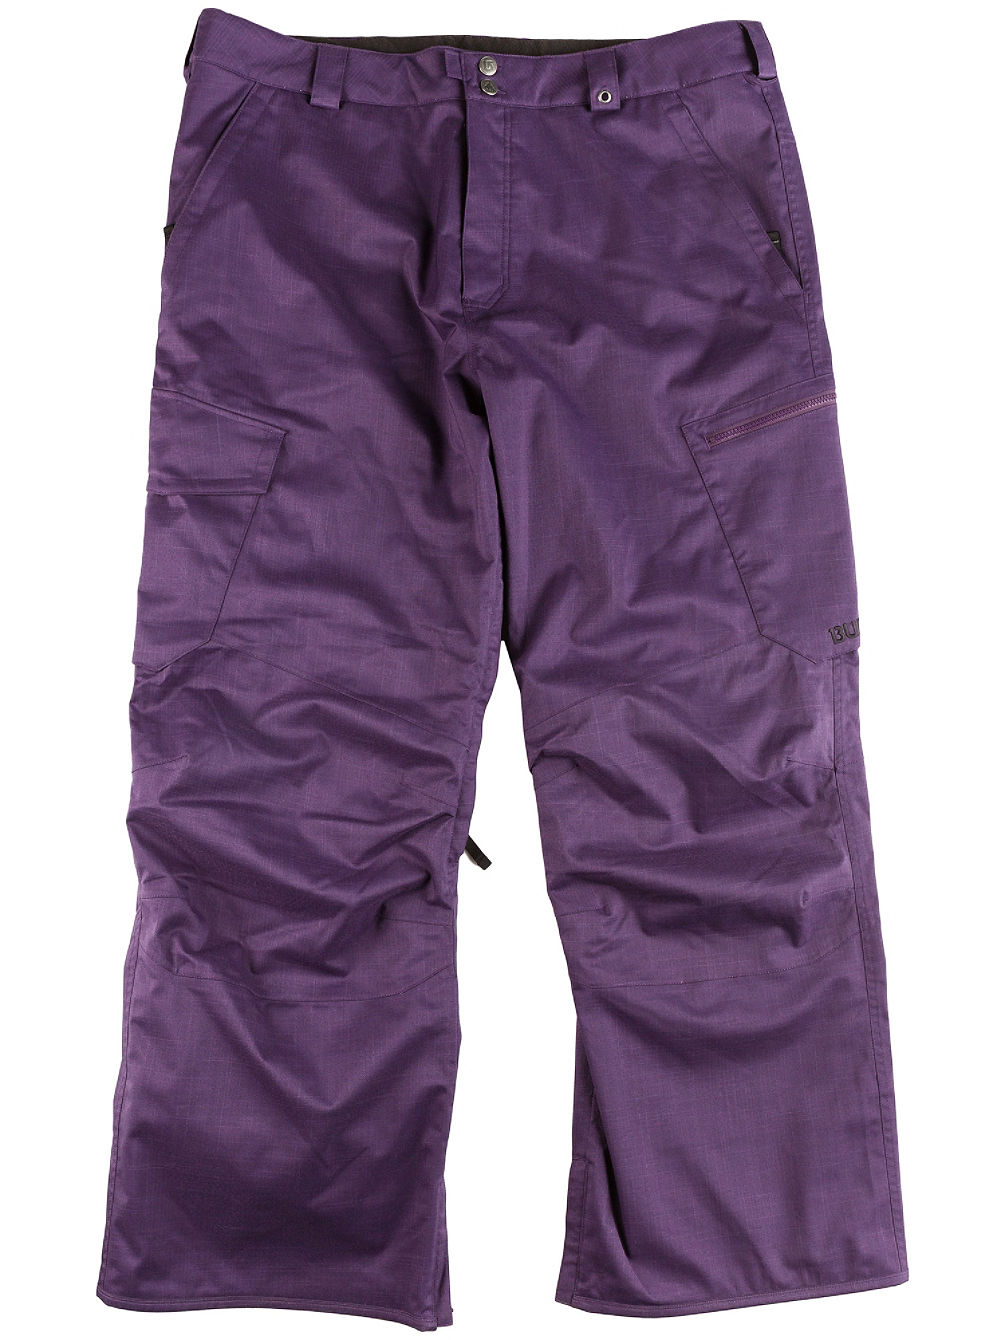 d7645971 Buy Burton Cargo Pant online at Blue Tomato